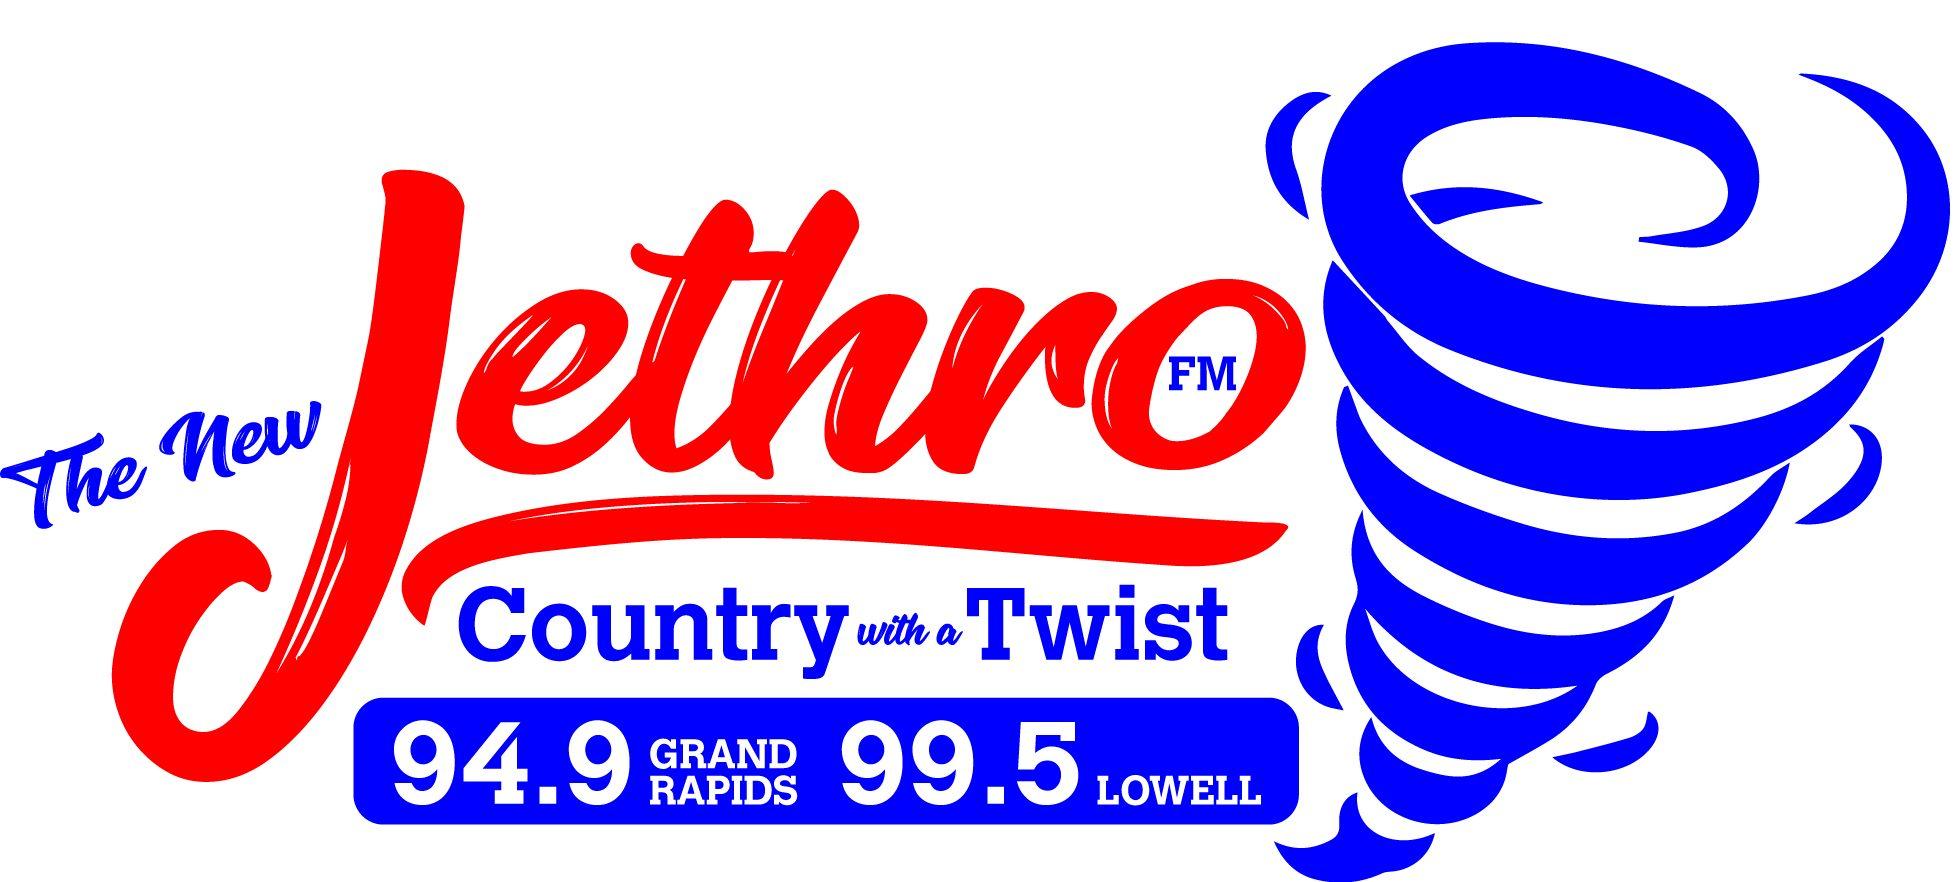 Jethro FM